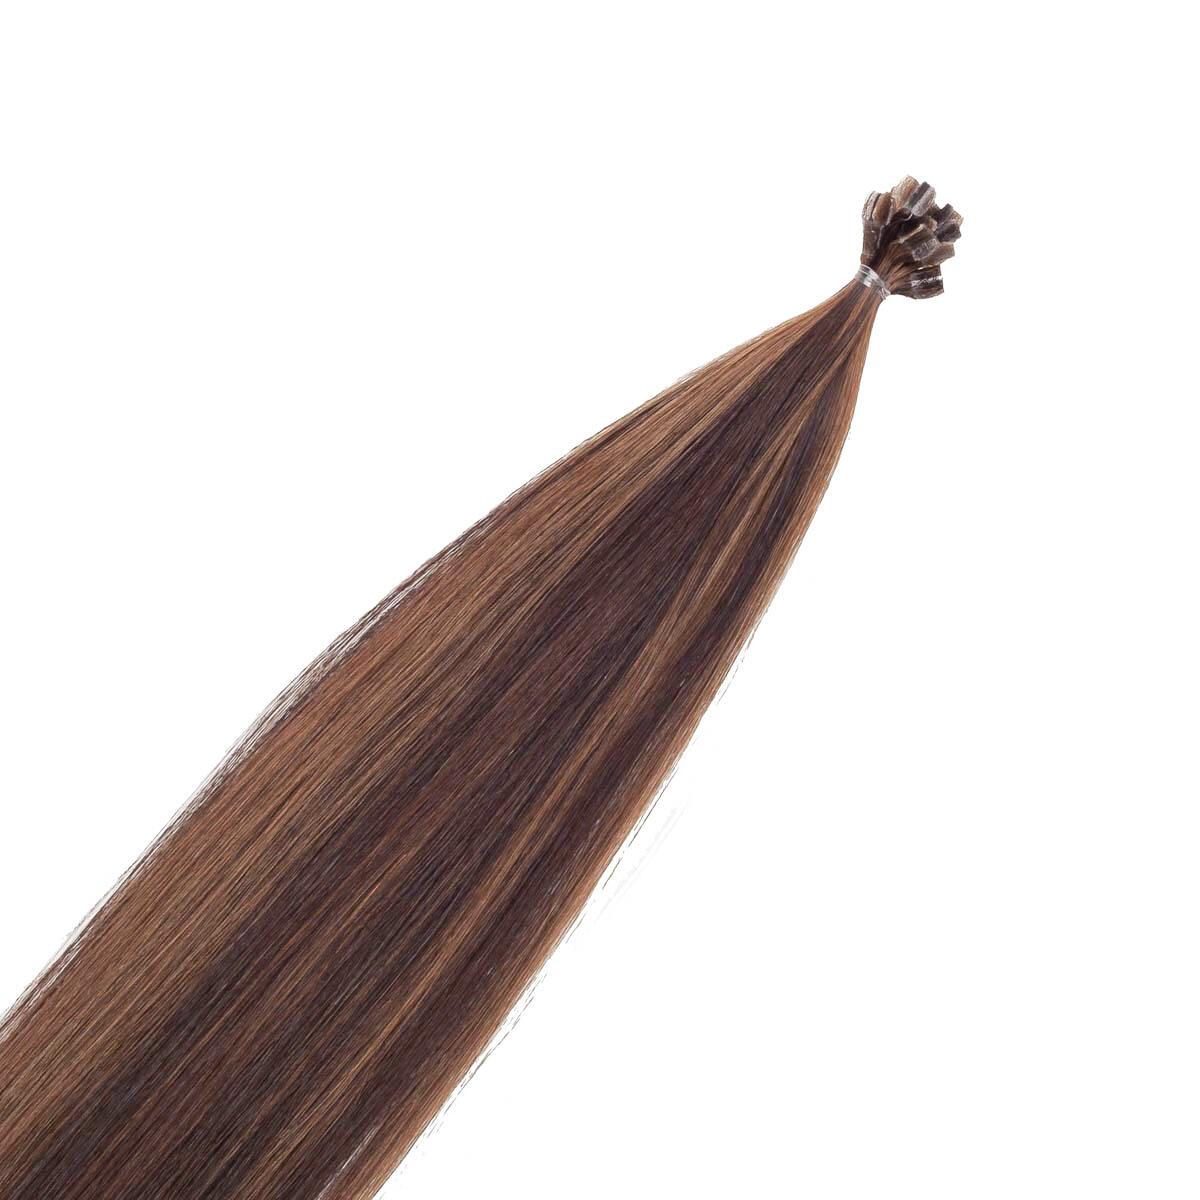 Nail Hair Original M2.3/5.0 Chocolate Mix 30 cm